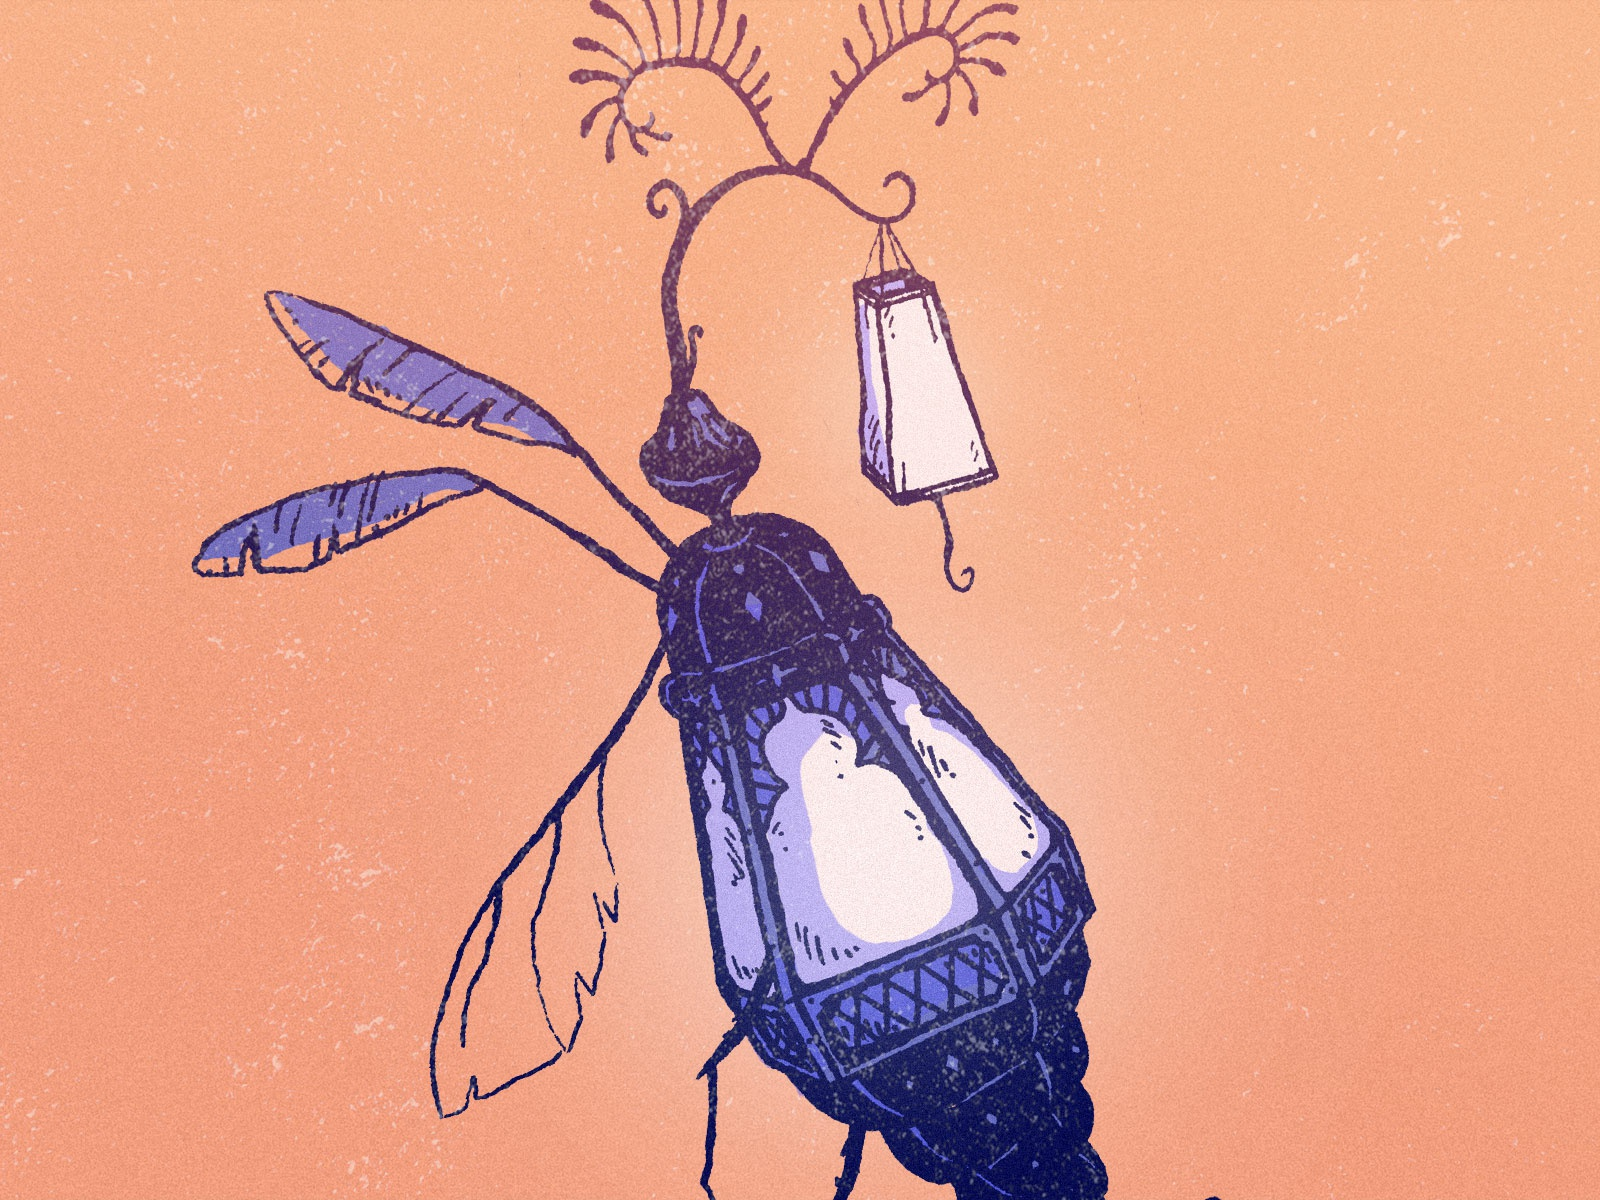 Lumine bug